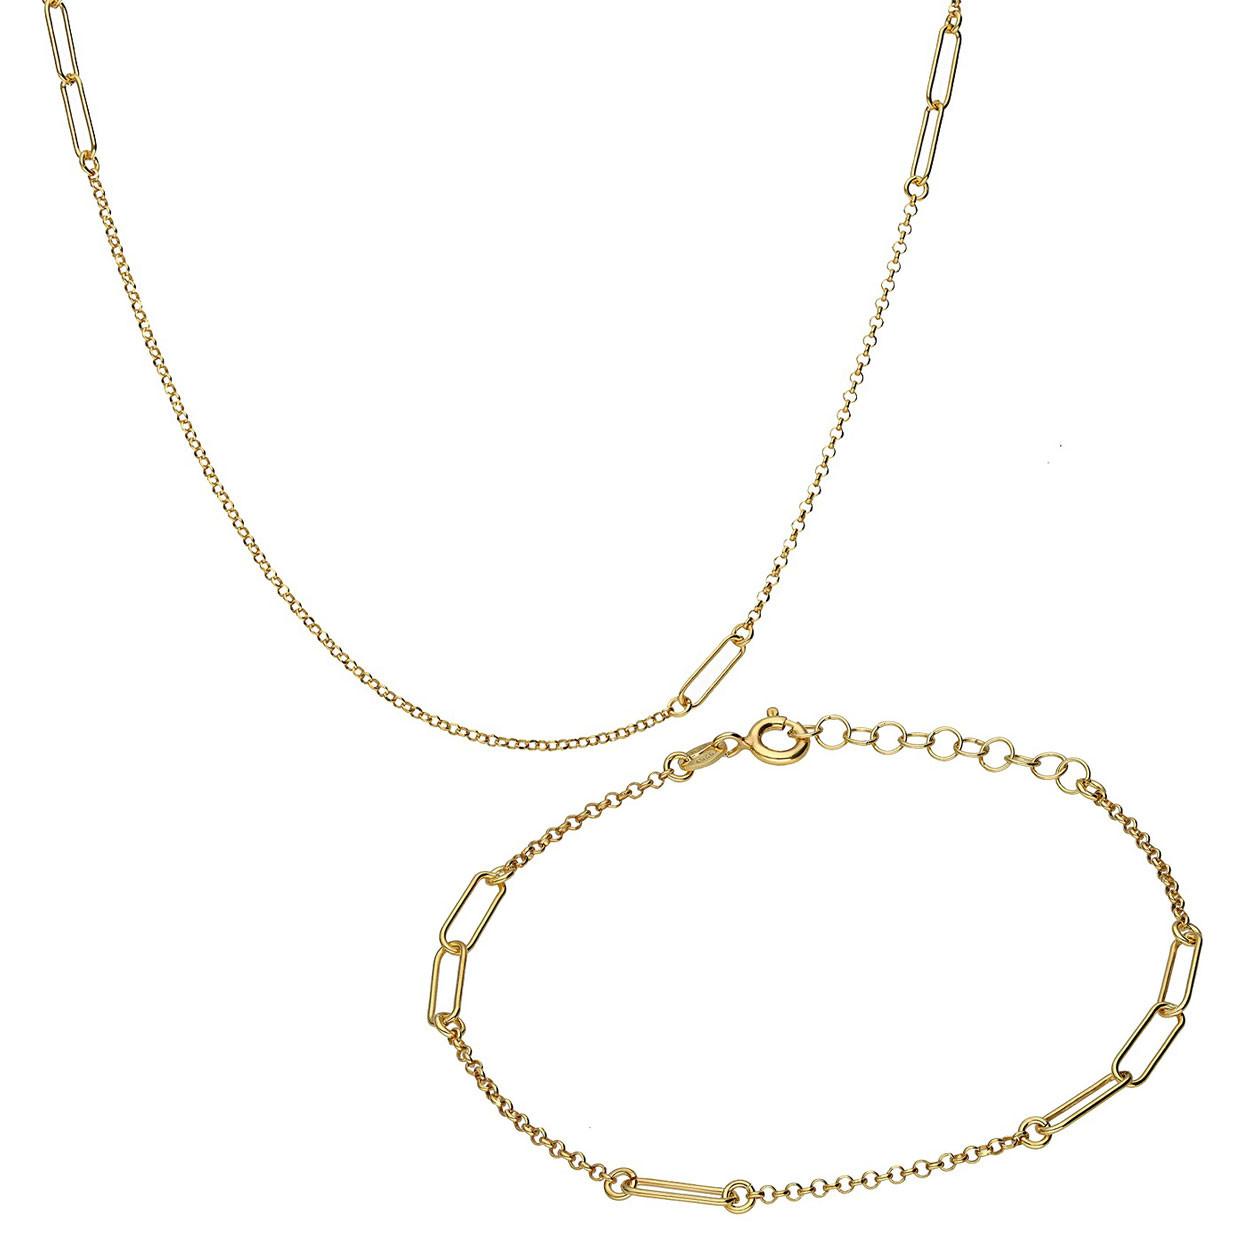 Komplet srebrny pozłacany z elementami ozdobnymi, naszyjnik i bransoleta, próba 925